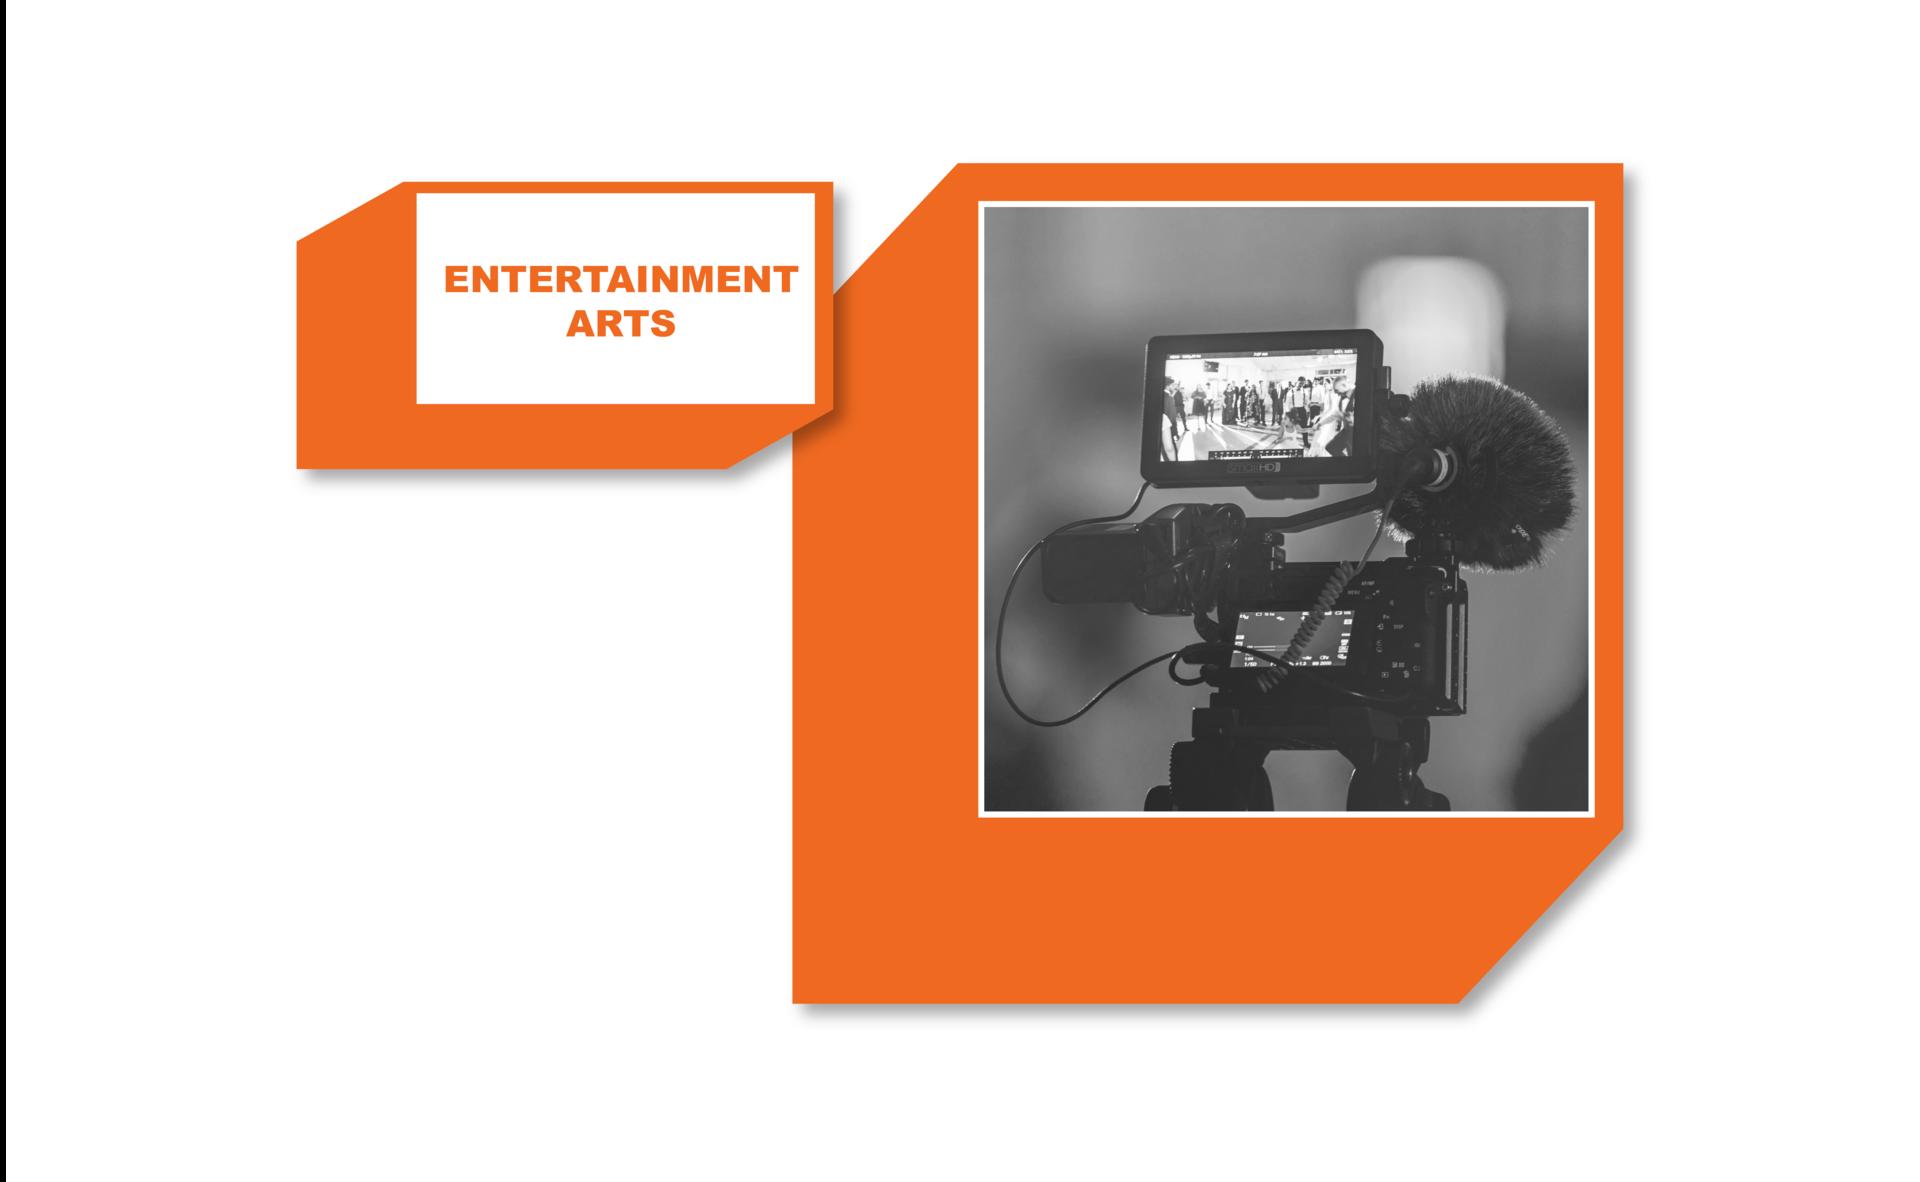 Entertainment Arts